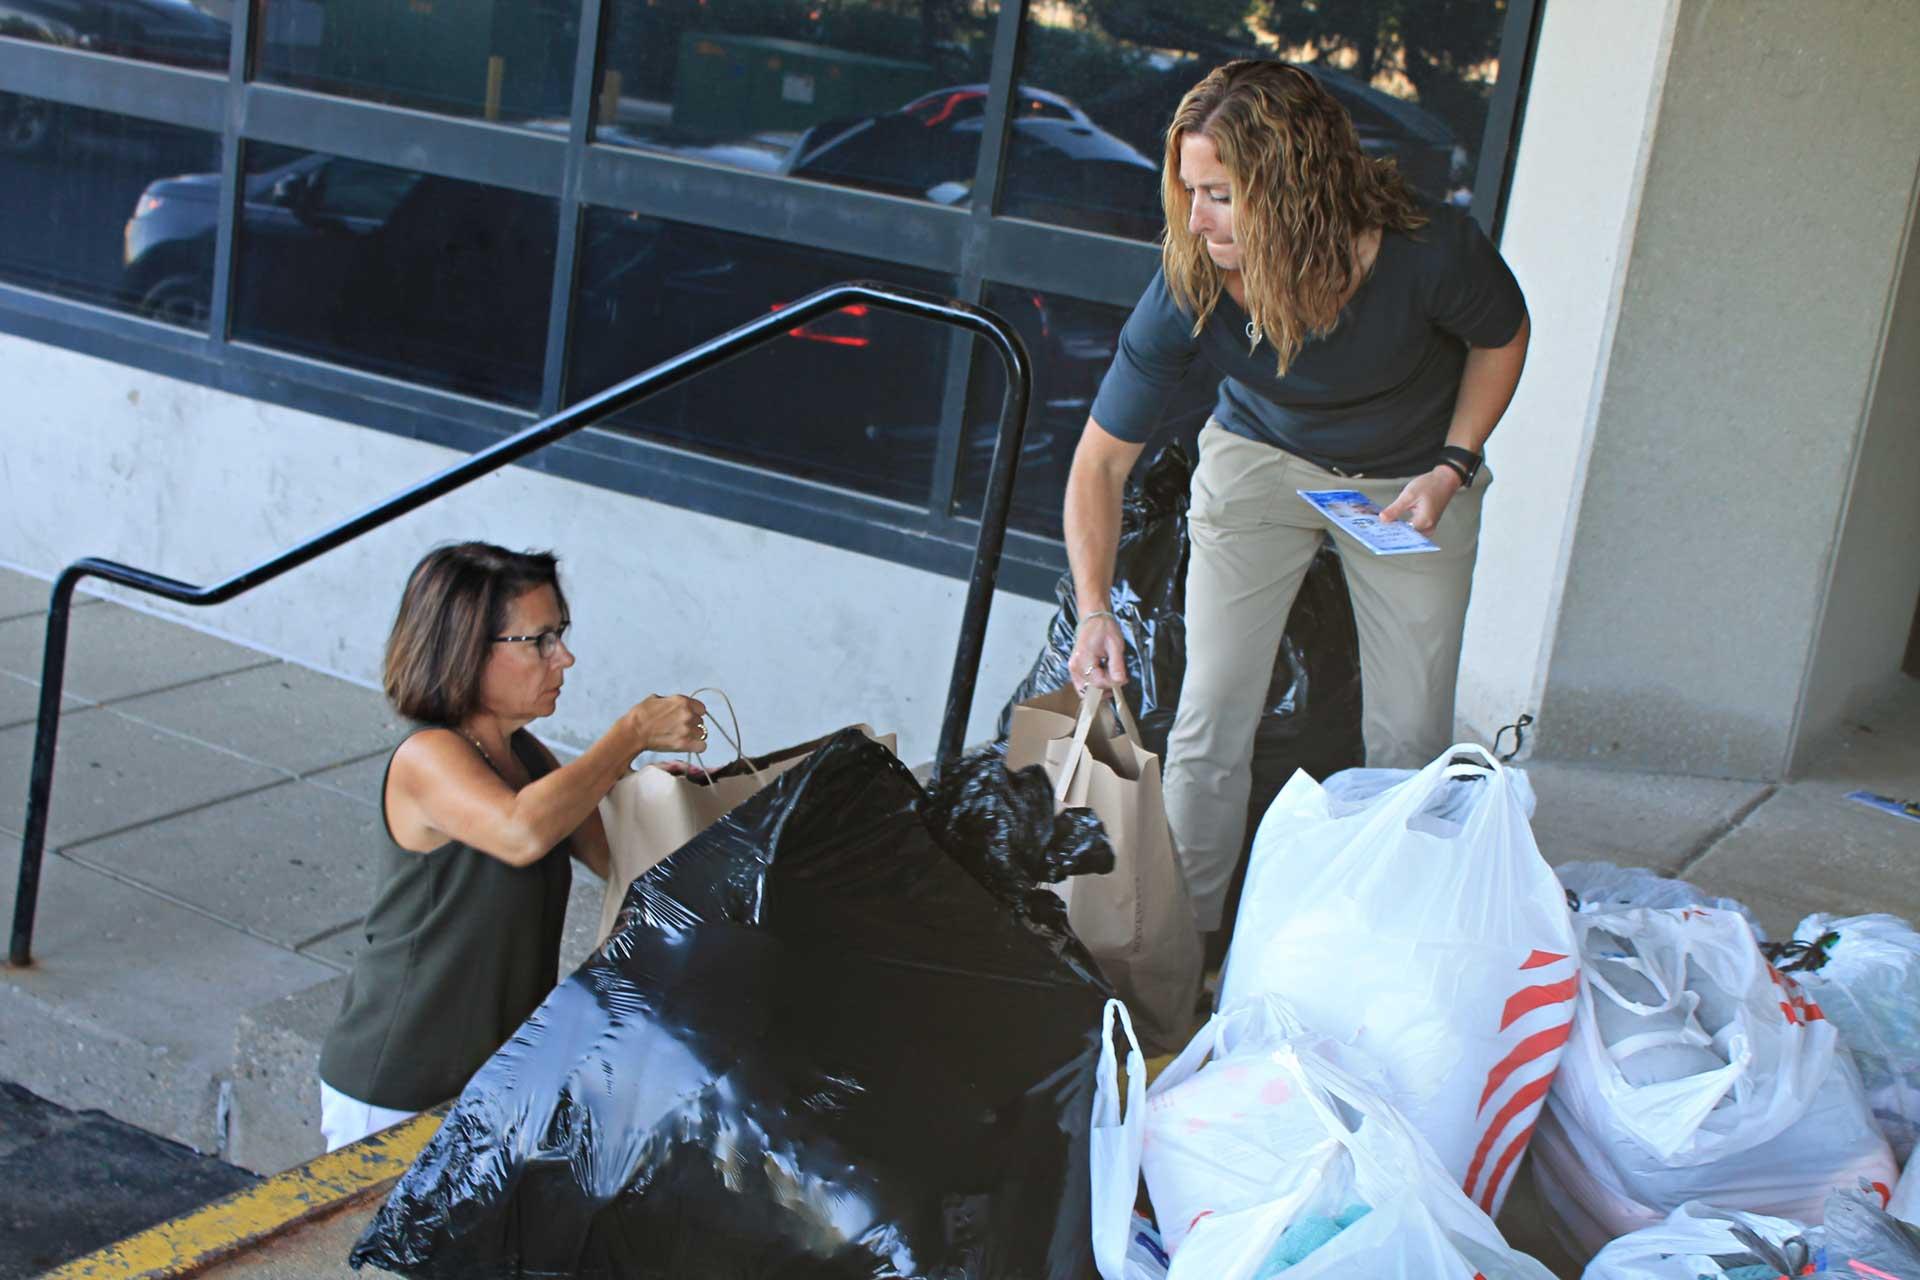 donating bags